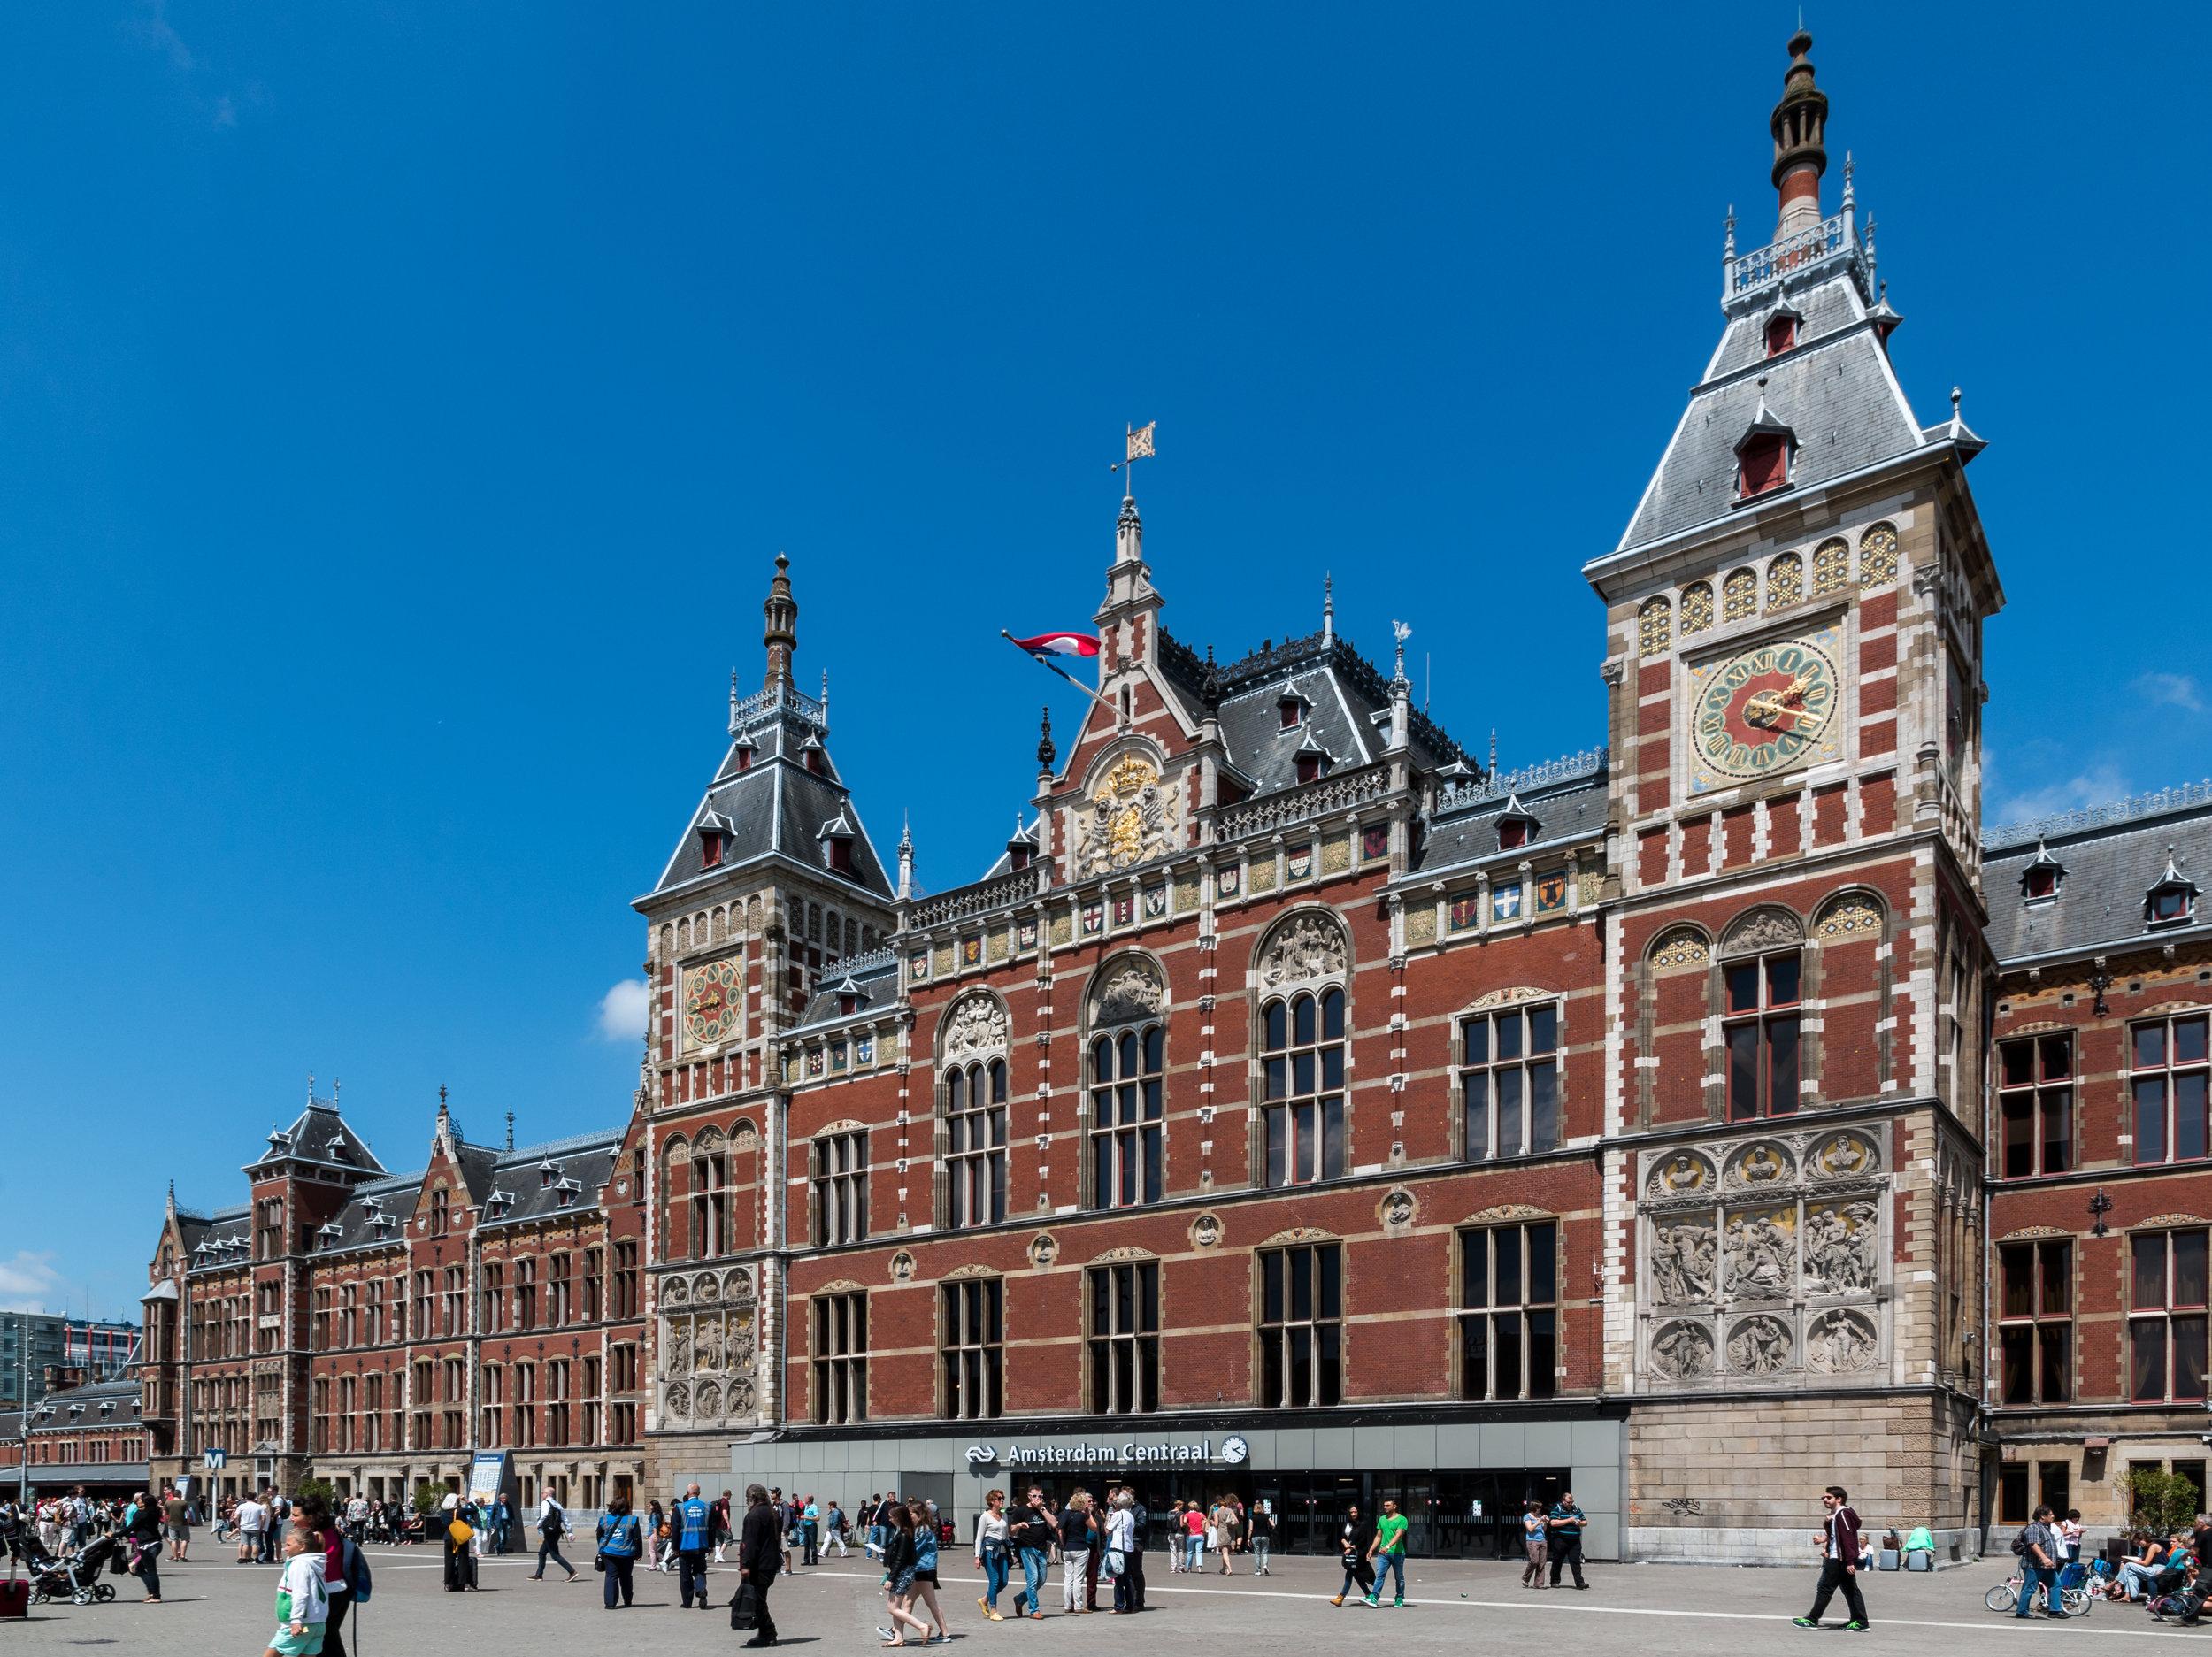 Amsterdam_(NL),_Centraal_Station_--_2015_--_7269.jpg